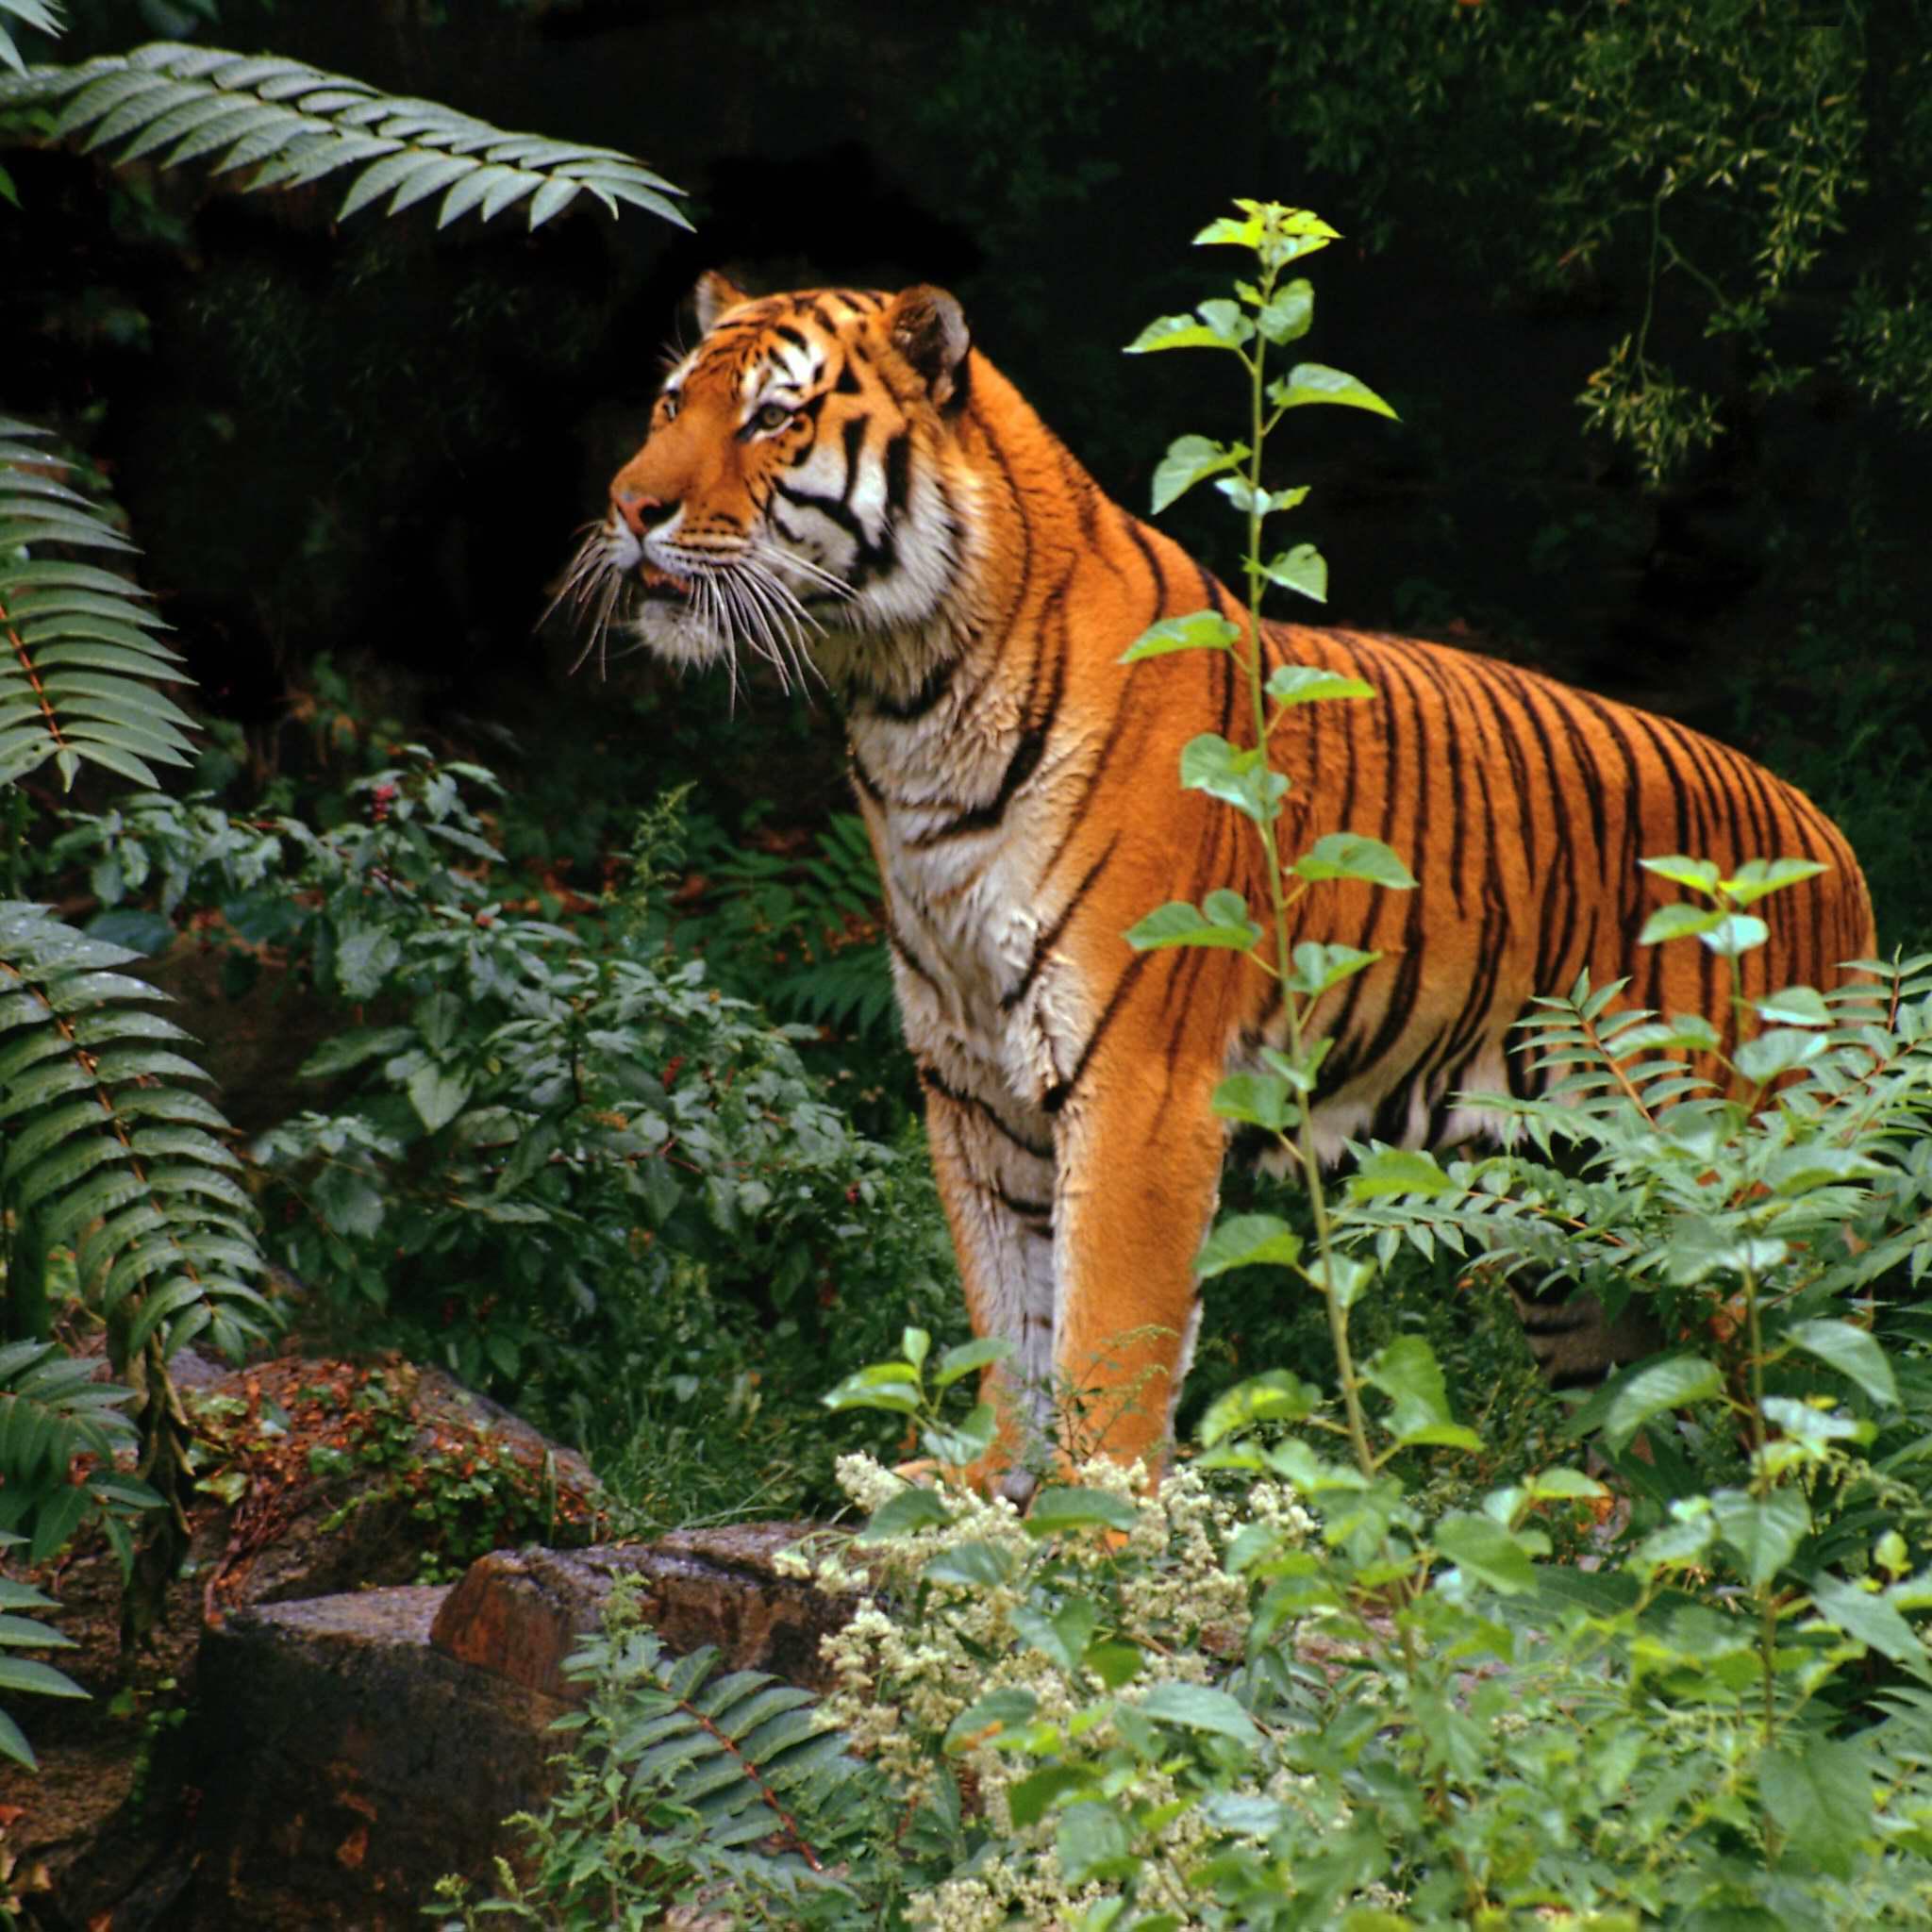 Tiger in jungle 3Wallpapers iPad Retina Tiger in jungle   iPad Retina